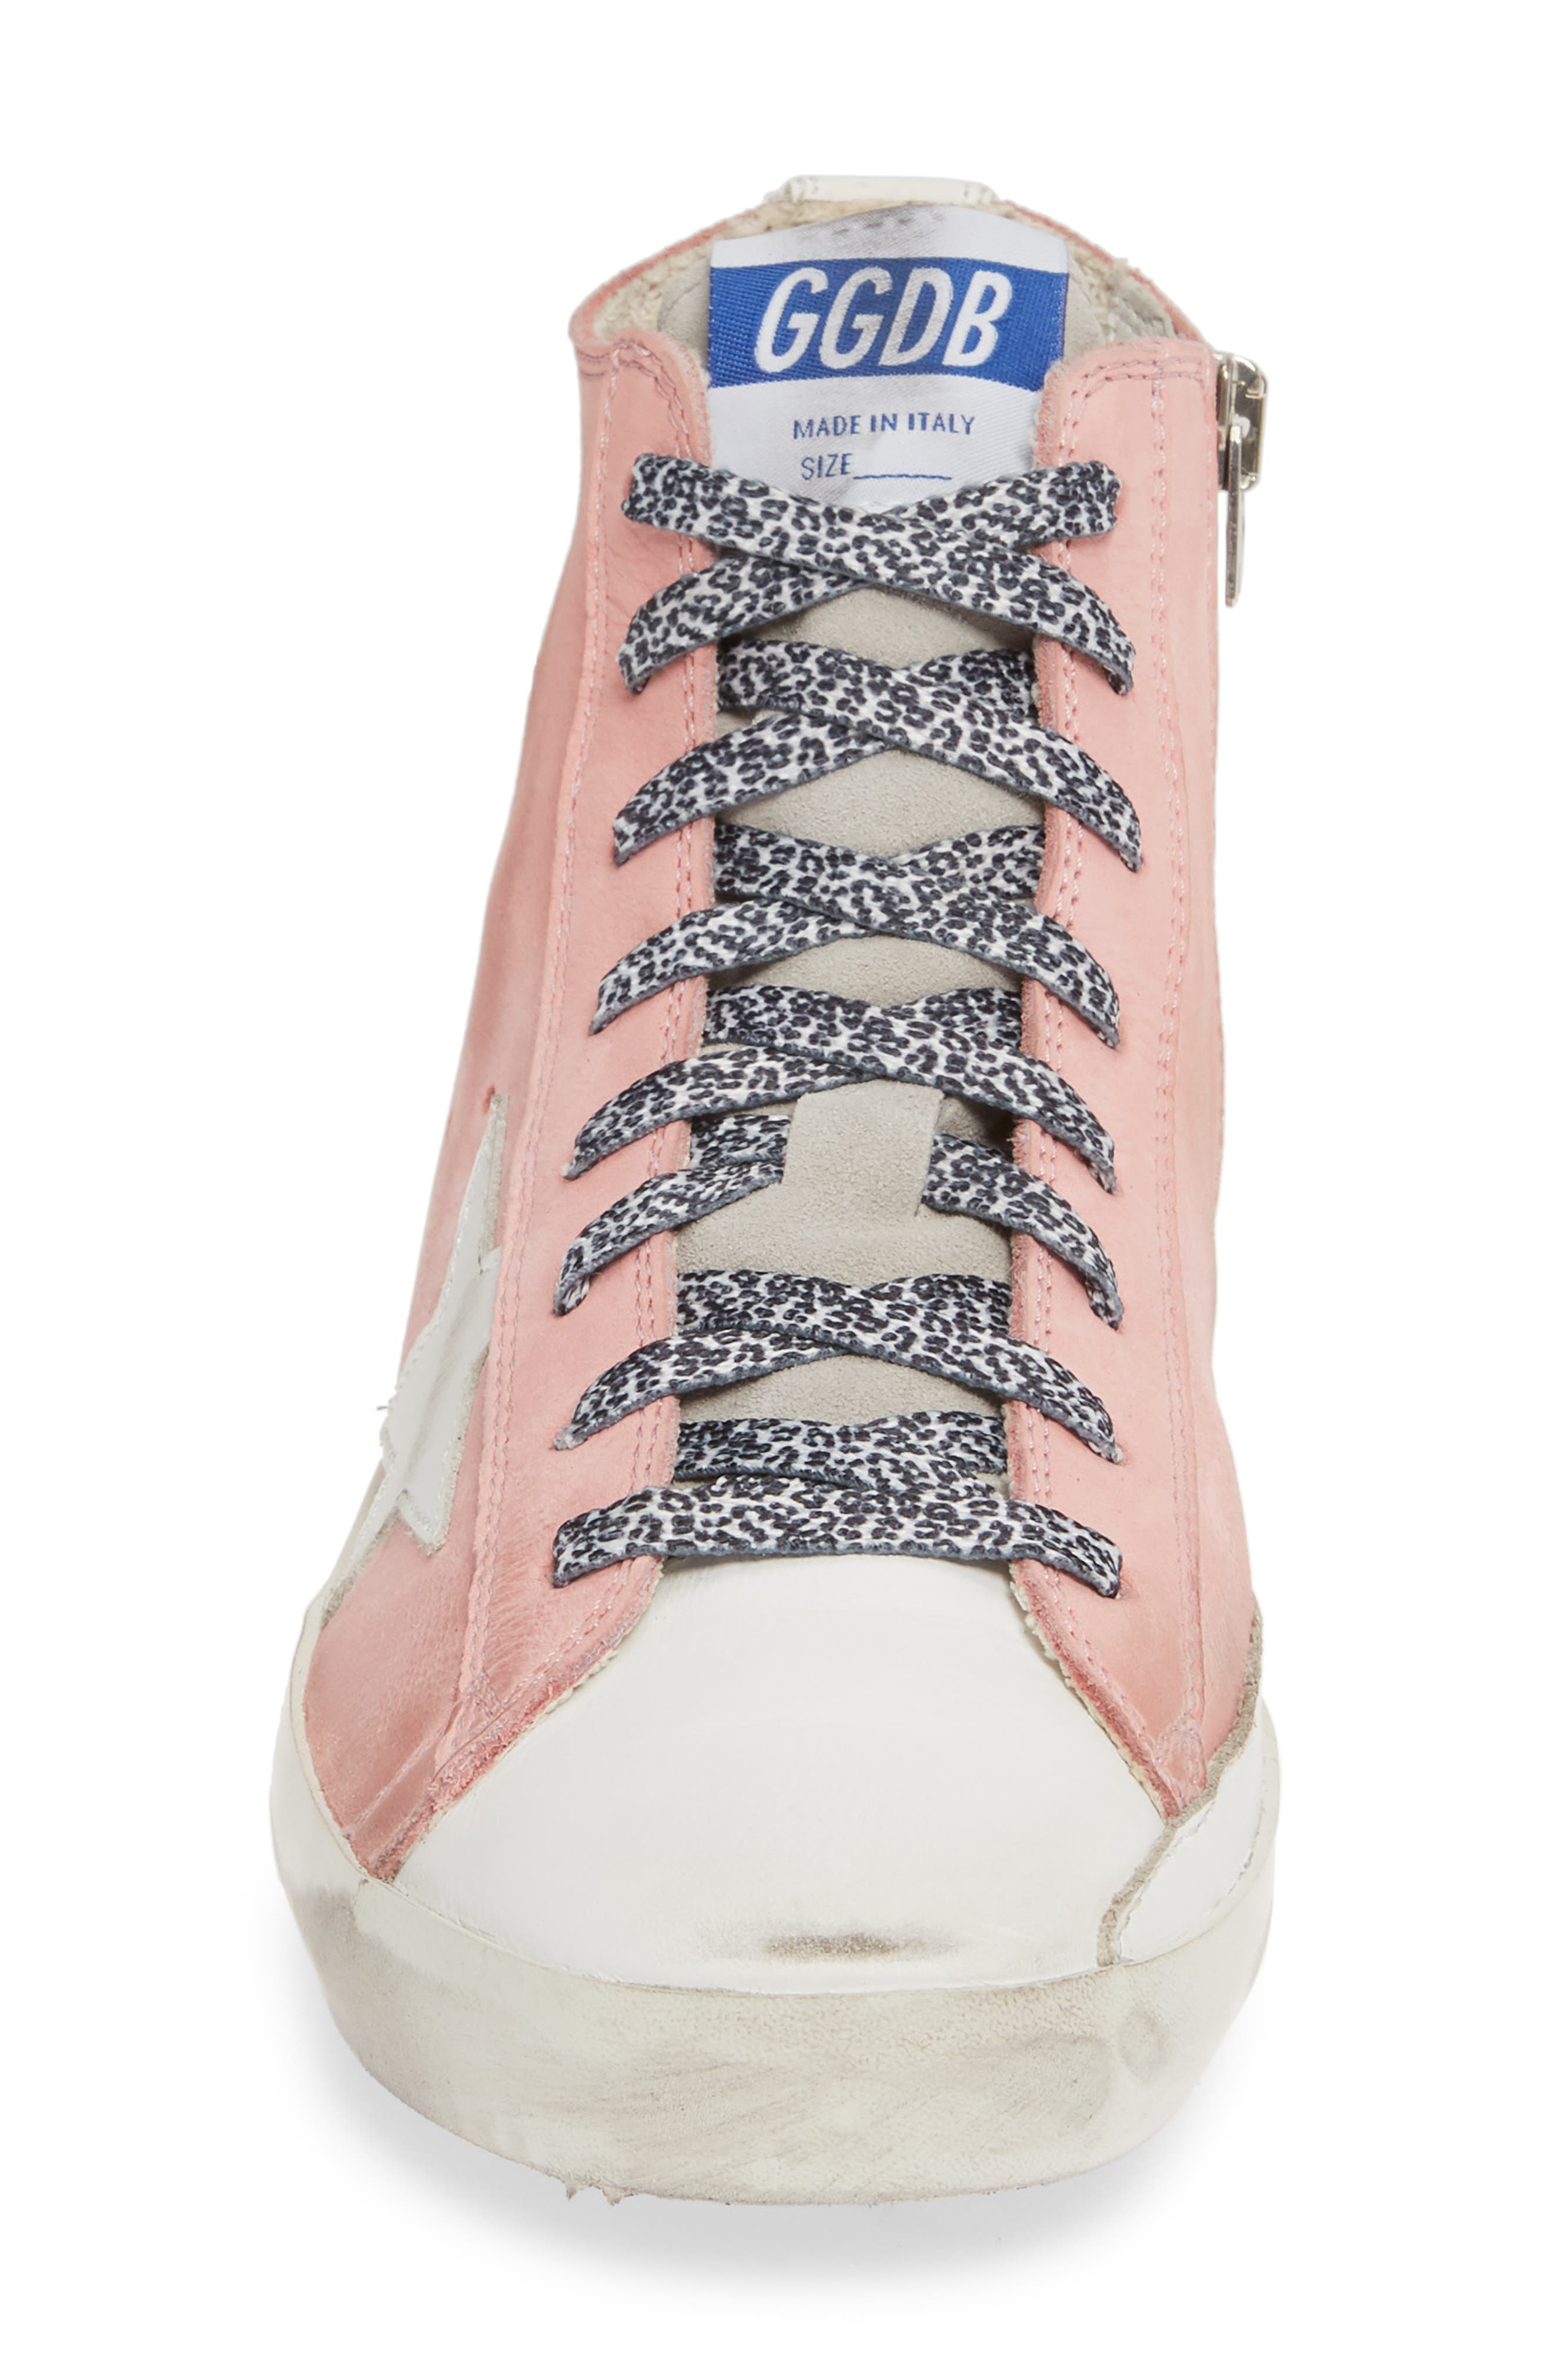 GOLDEN GOOSE, Francy High Top Sneaker, Alternate thumbnail 4, color, PINK PEONY